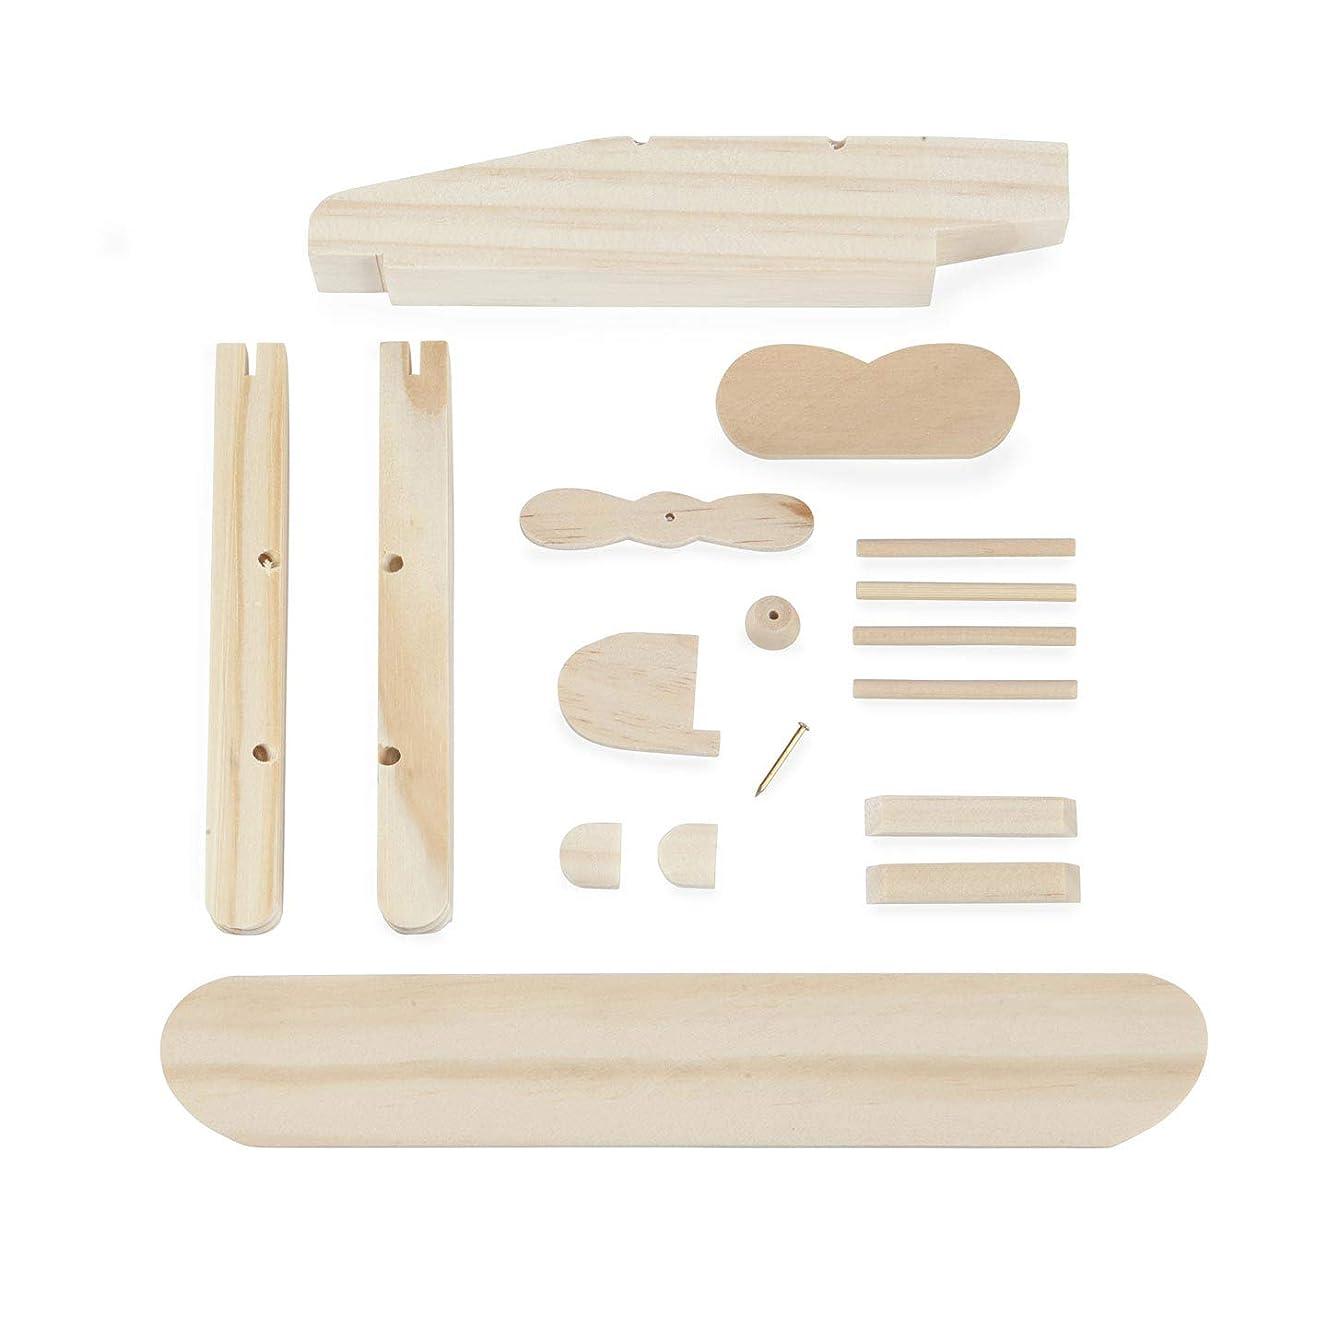 Bulk Buy: Darice DIY Crafts Wood Model Kit Pontoon Plane (6-Pack) GC100